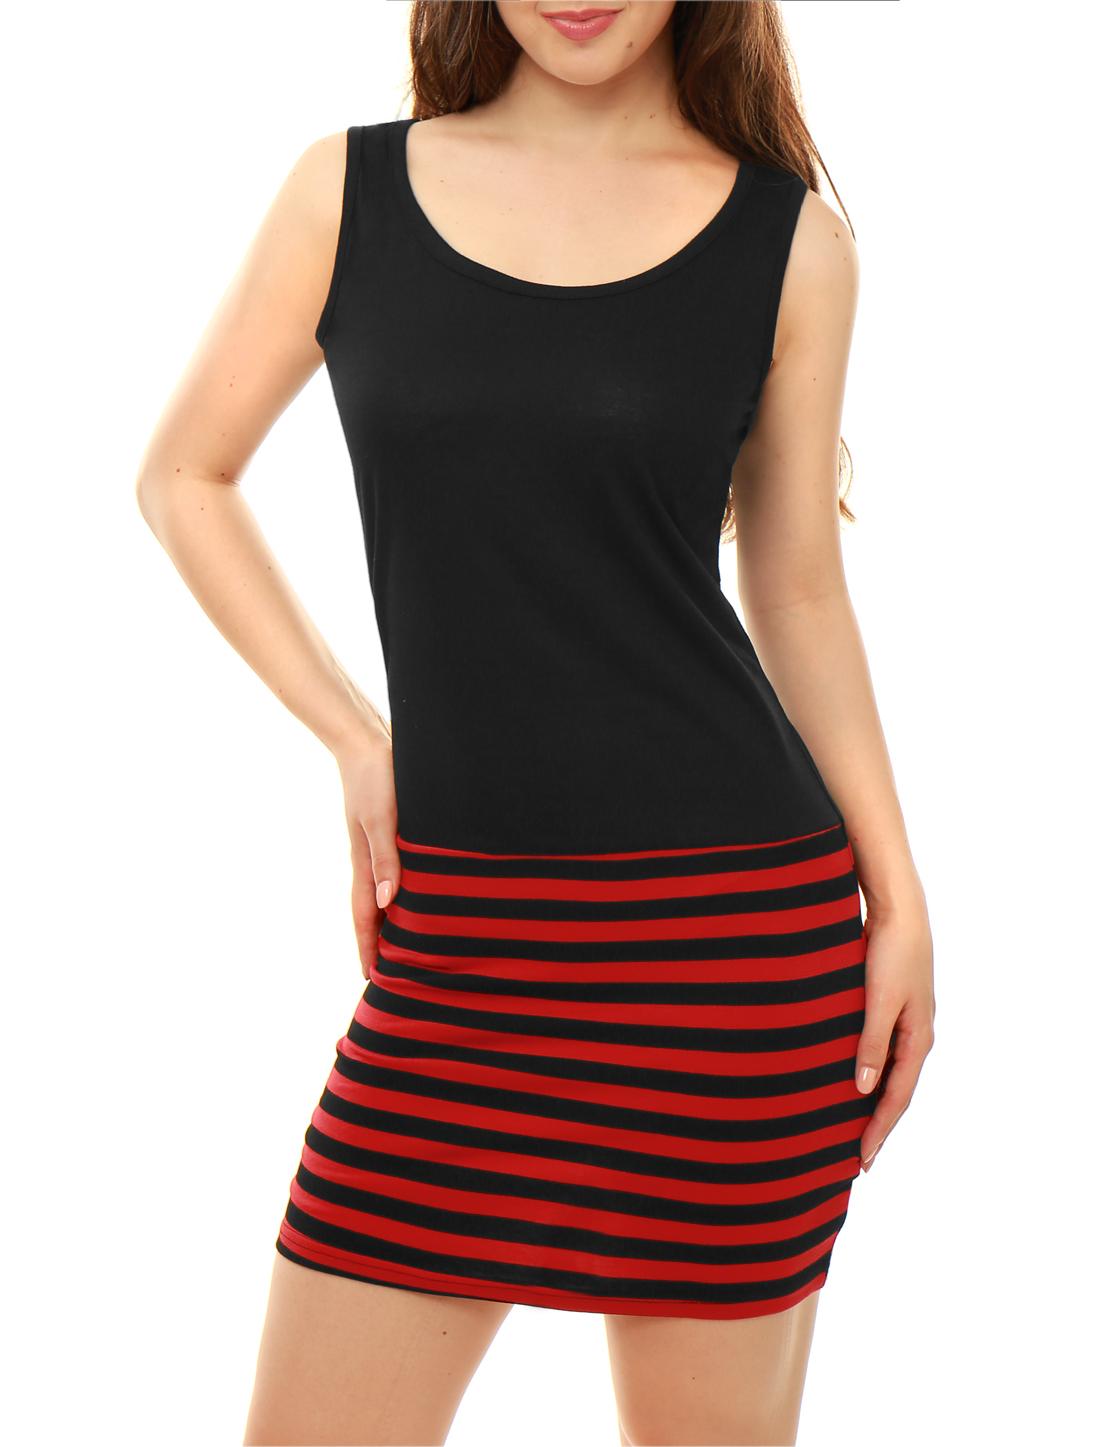 Lady NEW Contrast Color Design Blck Red Striped Slim Fit Mini Dress XL